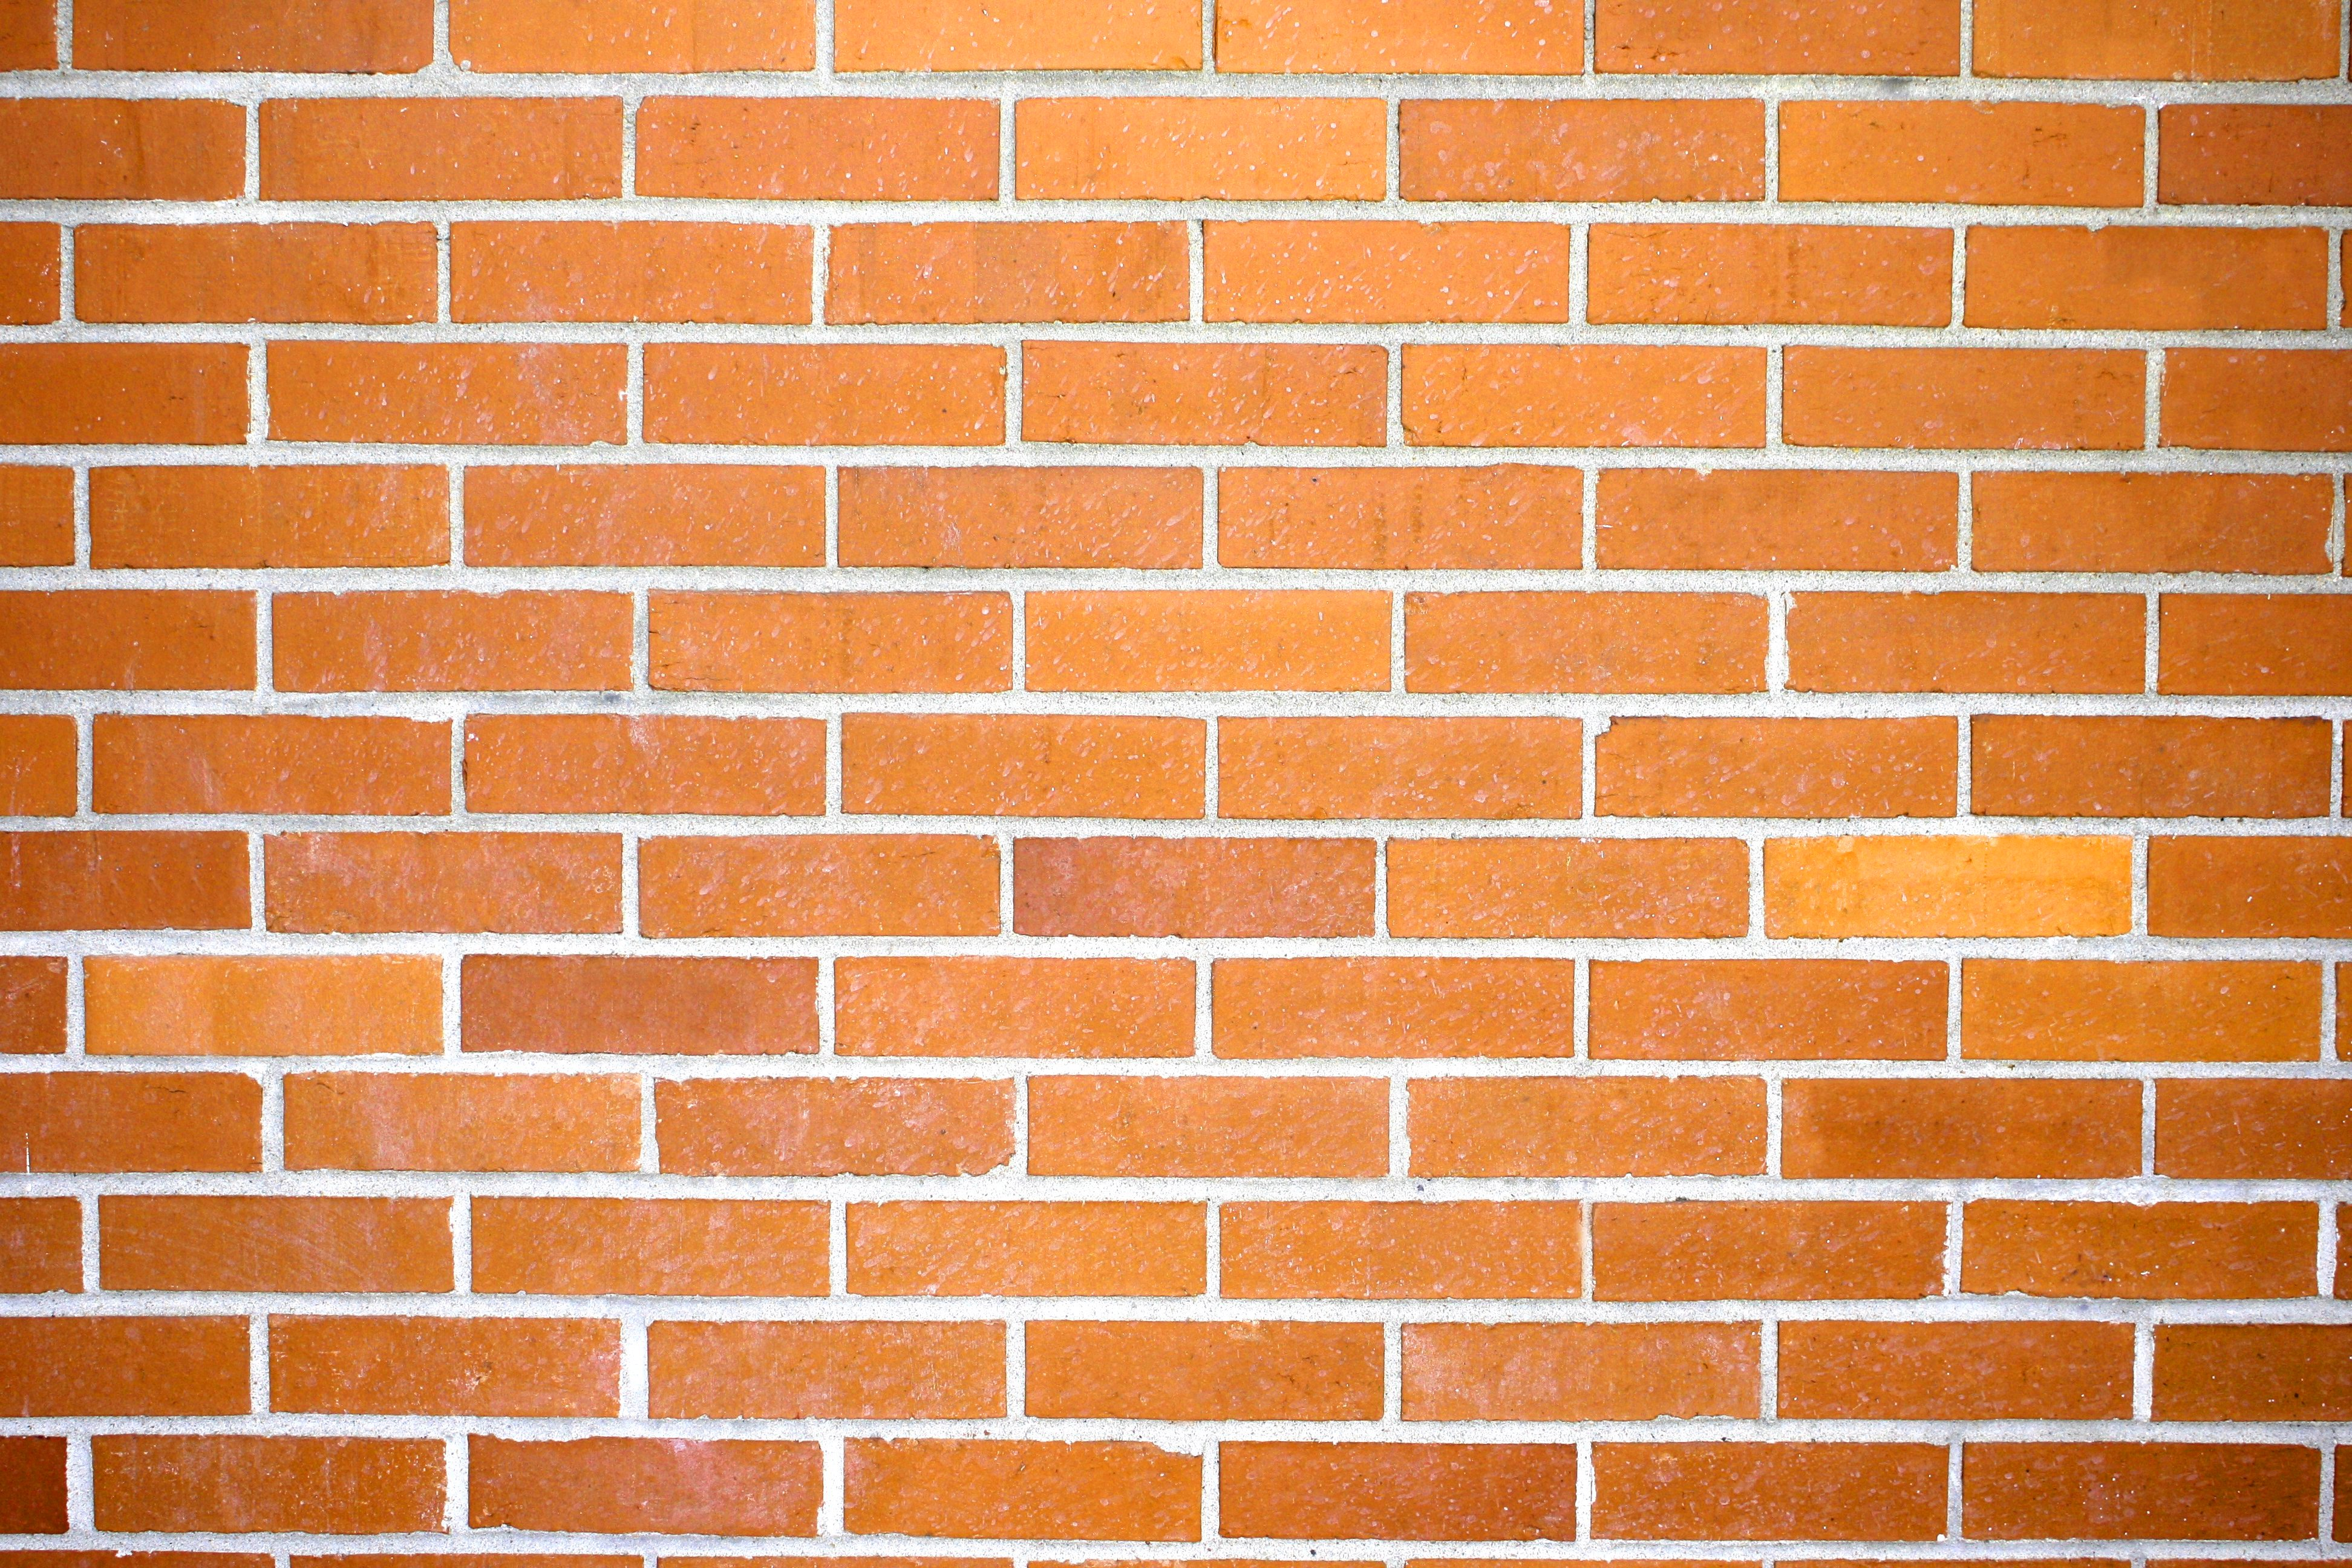 Orange Brick Wall Texture Picture.